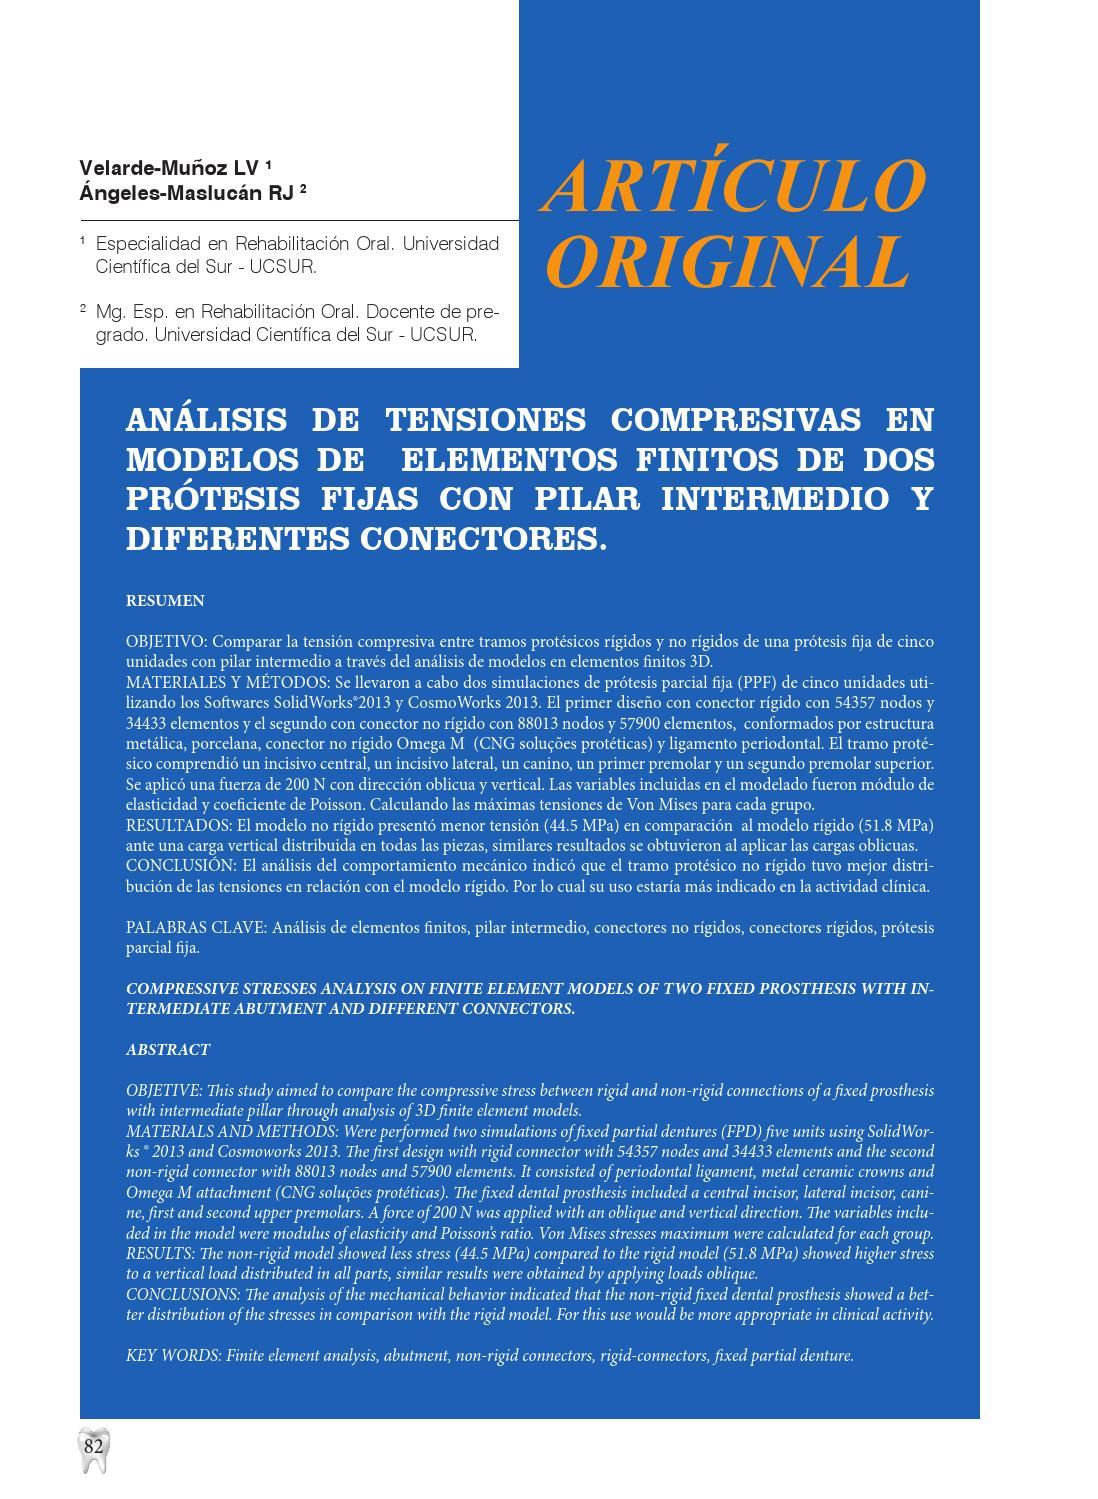 Revista Científica Odontológica. VOL. 2, No. 1. by Universidad ...